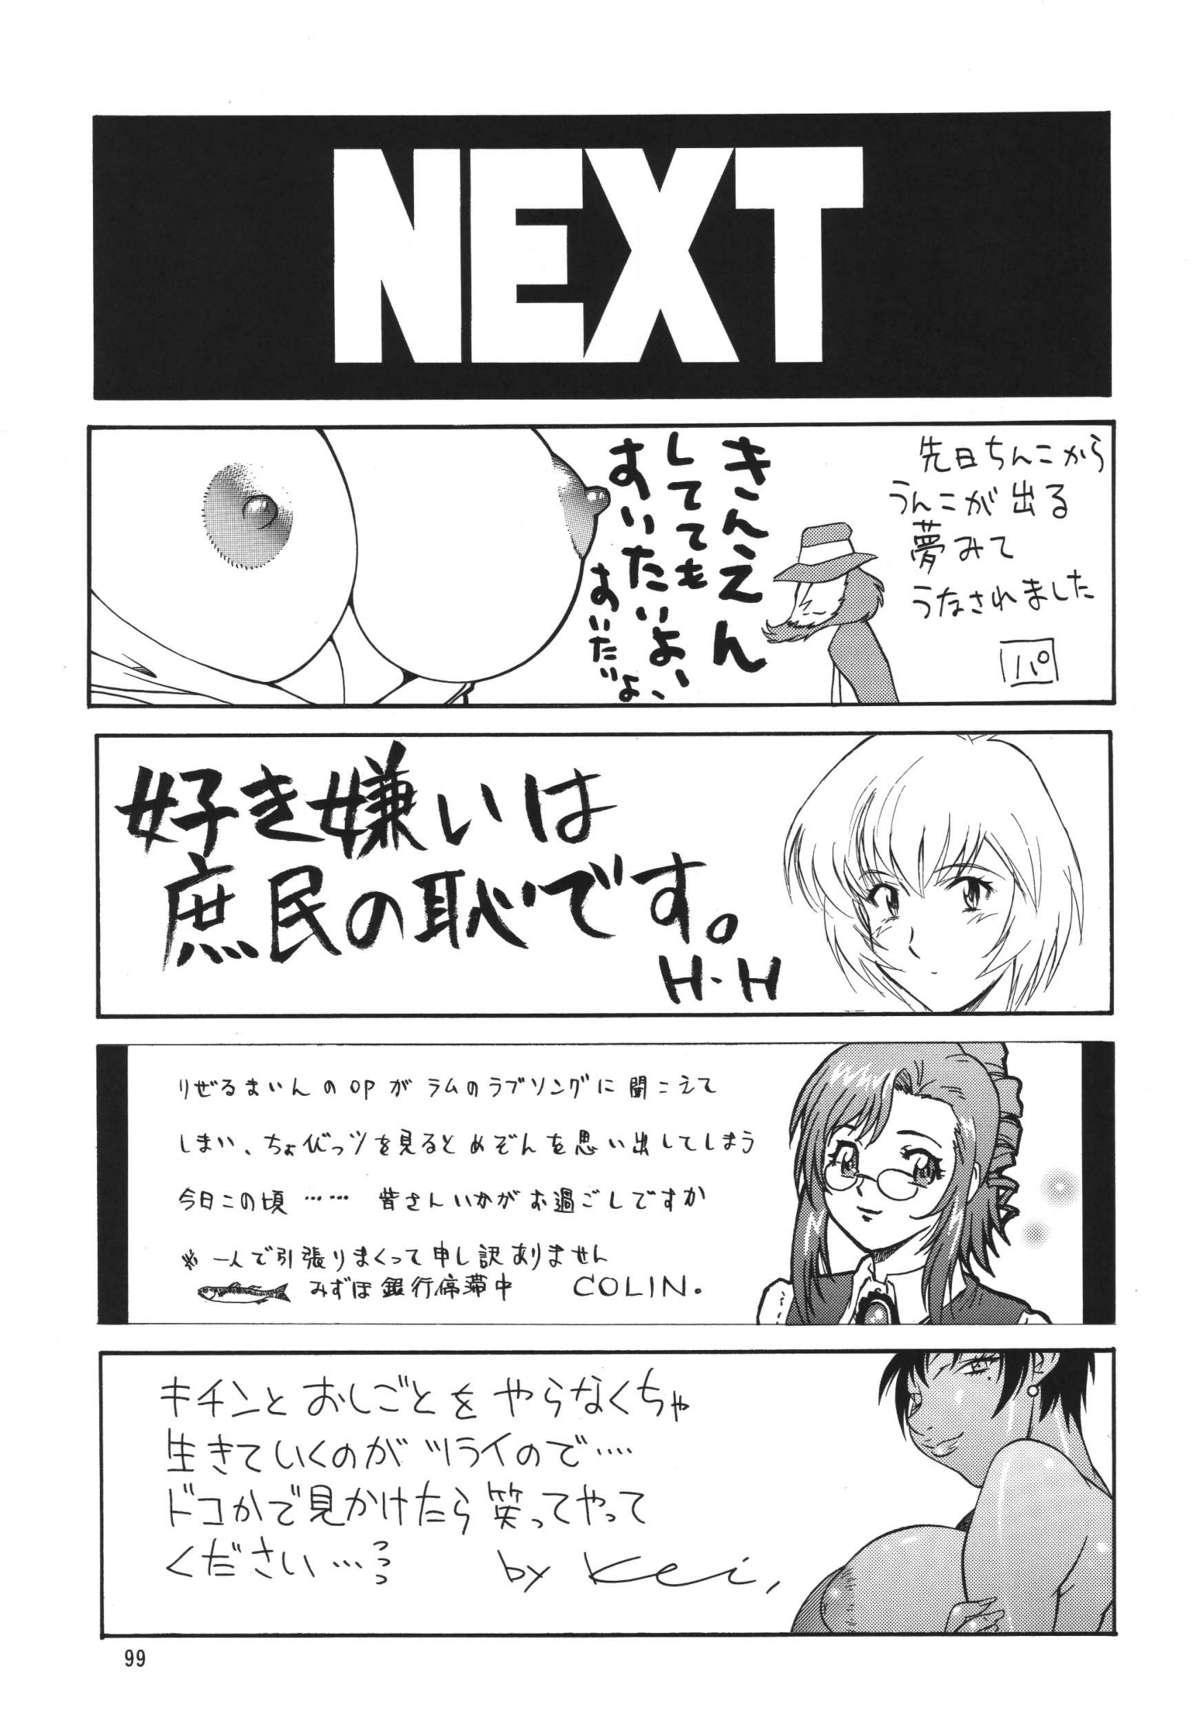 NEXT Climax Magazine 10 98